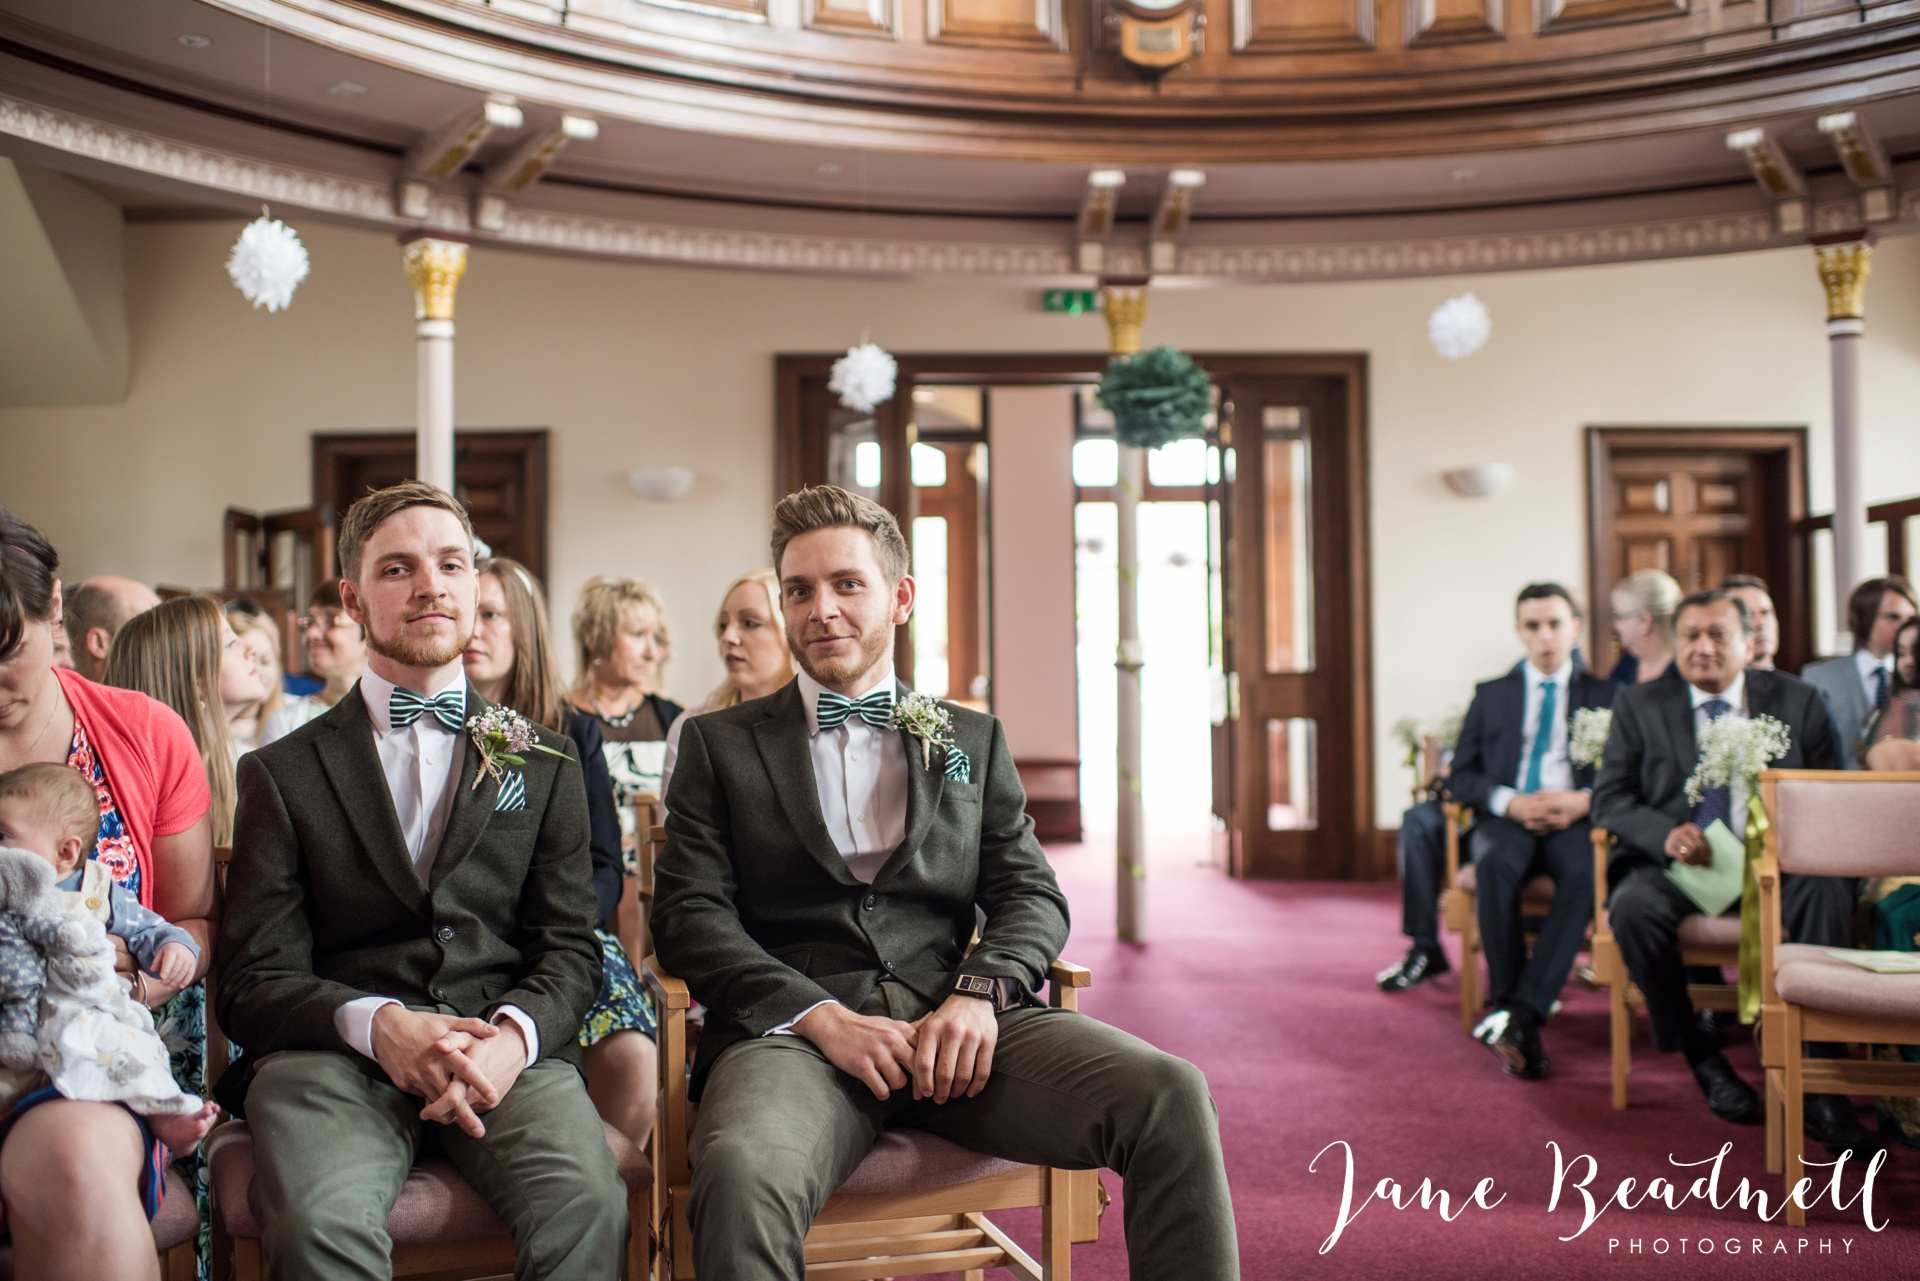 Jane Beadnell fine art wedding photographer The Old Deanery Ripon_0022